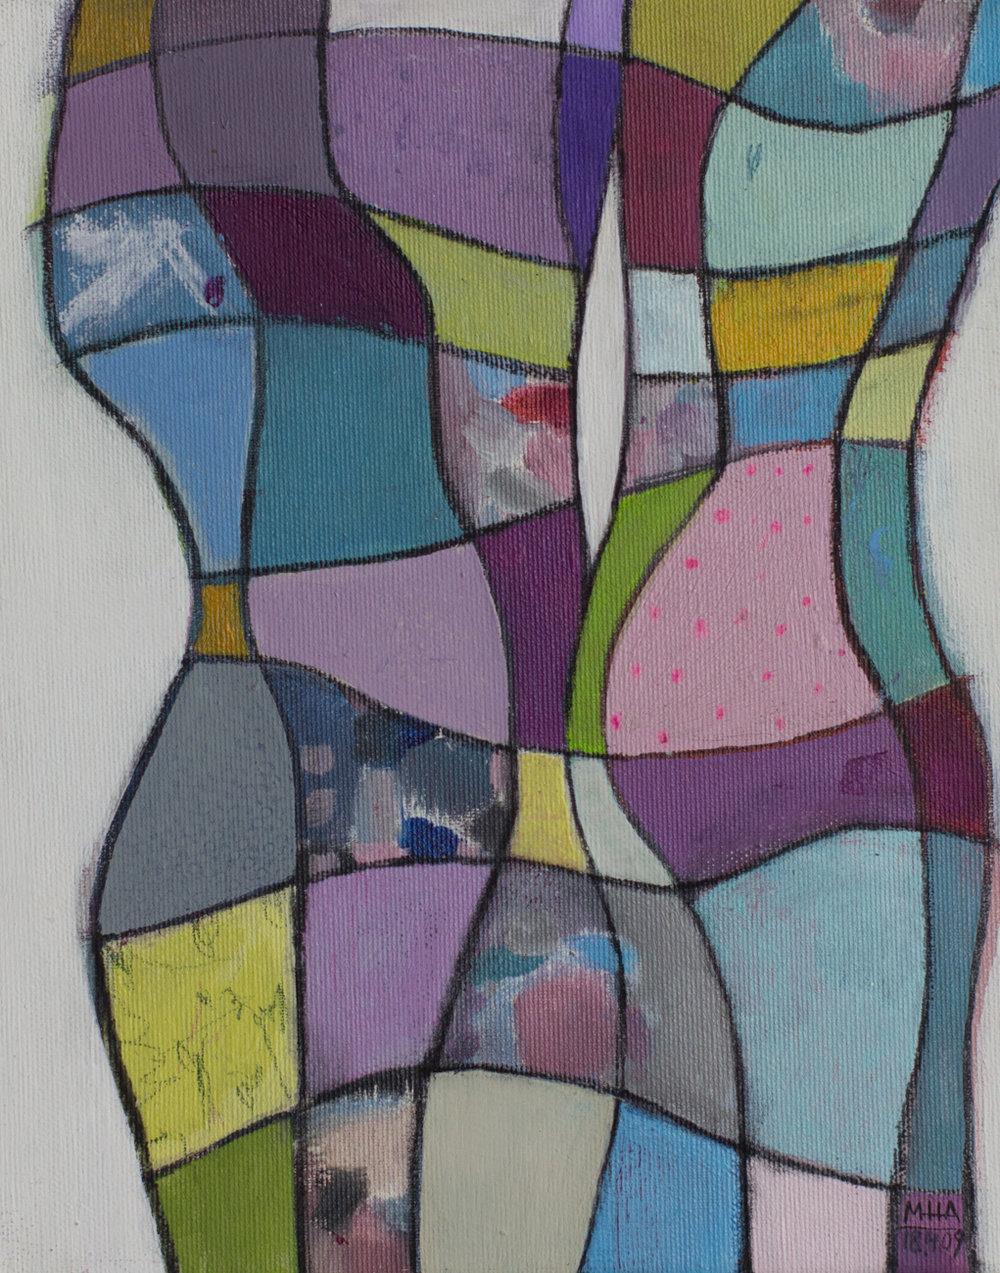 Fantasie in Linien 10 , 2009,Acryl auf Leinwand, 24x30 cm